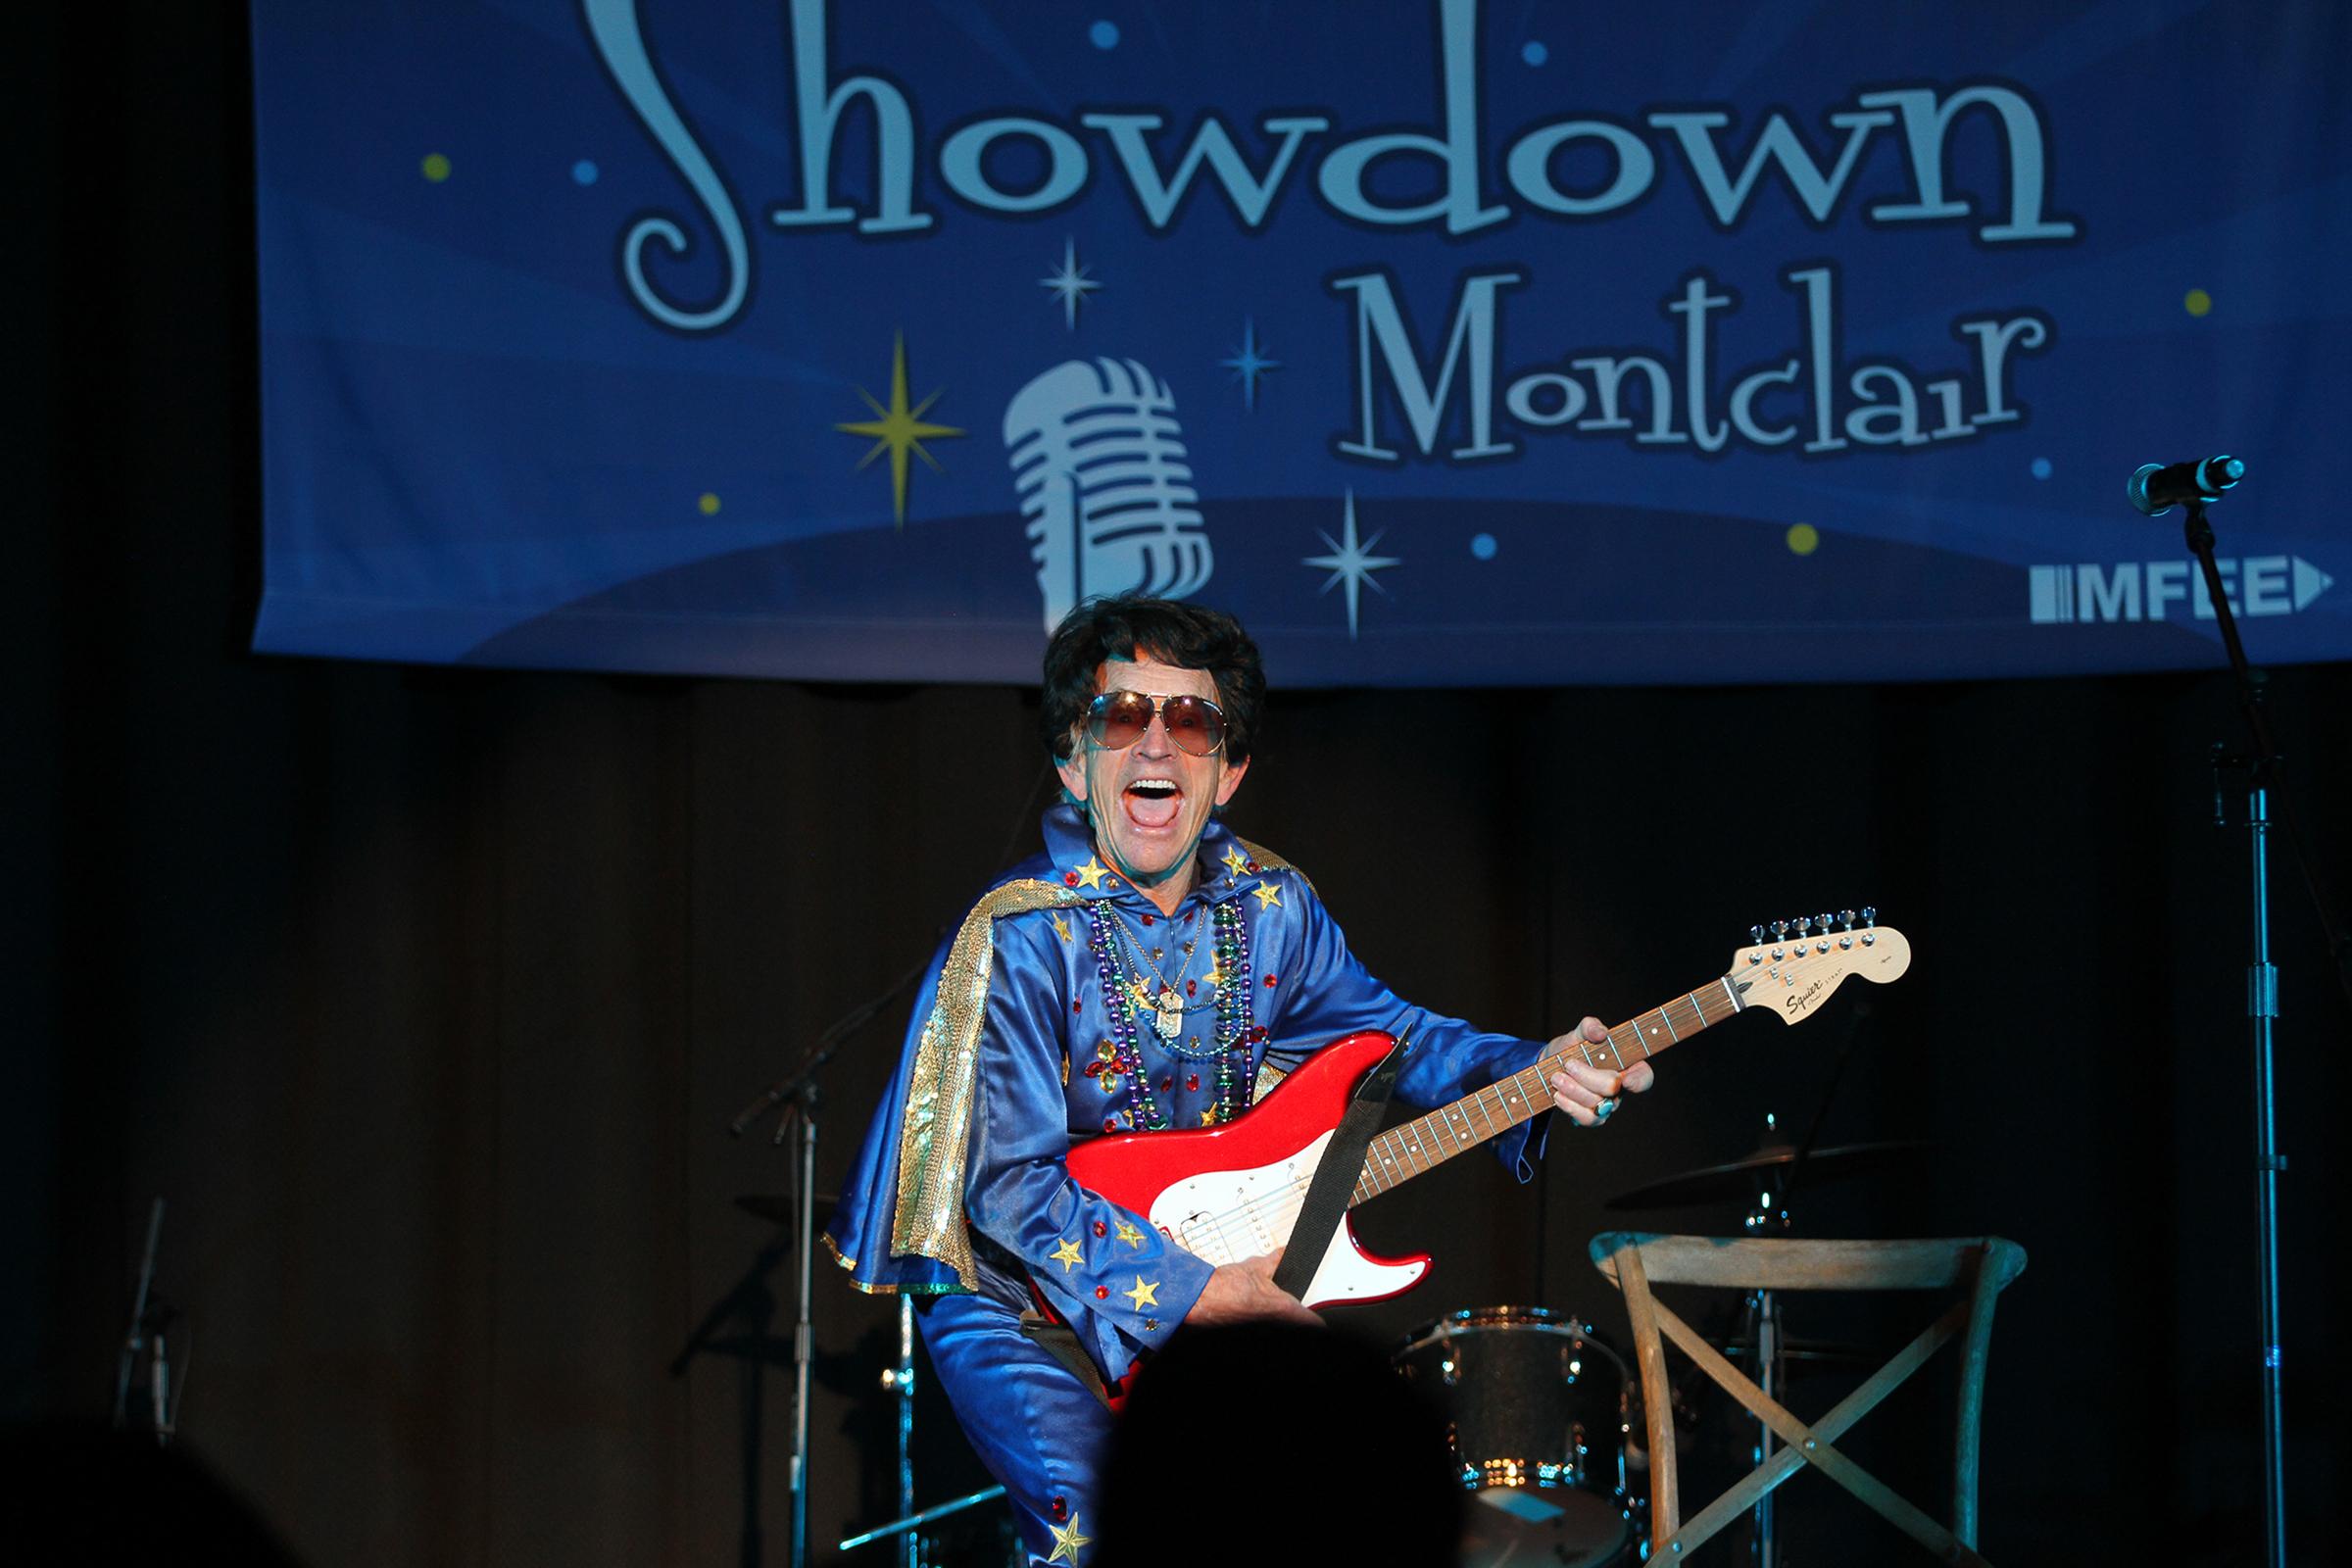 Showdown Montclair